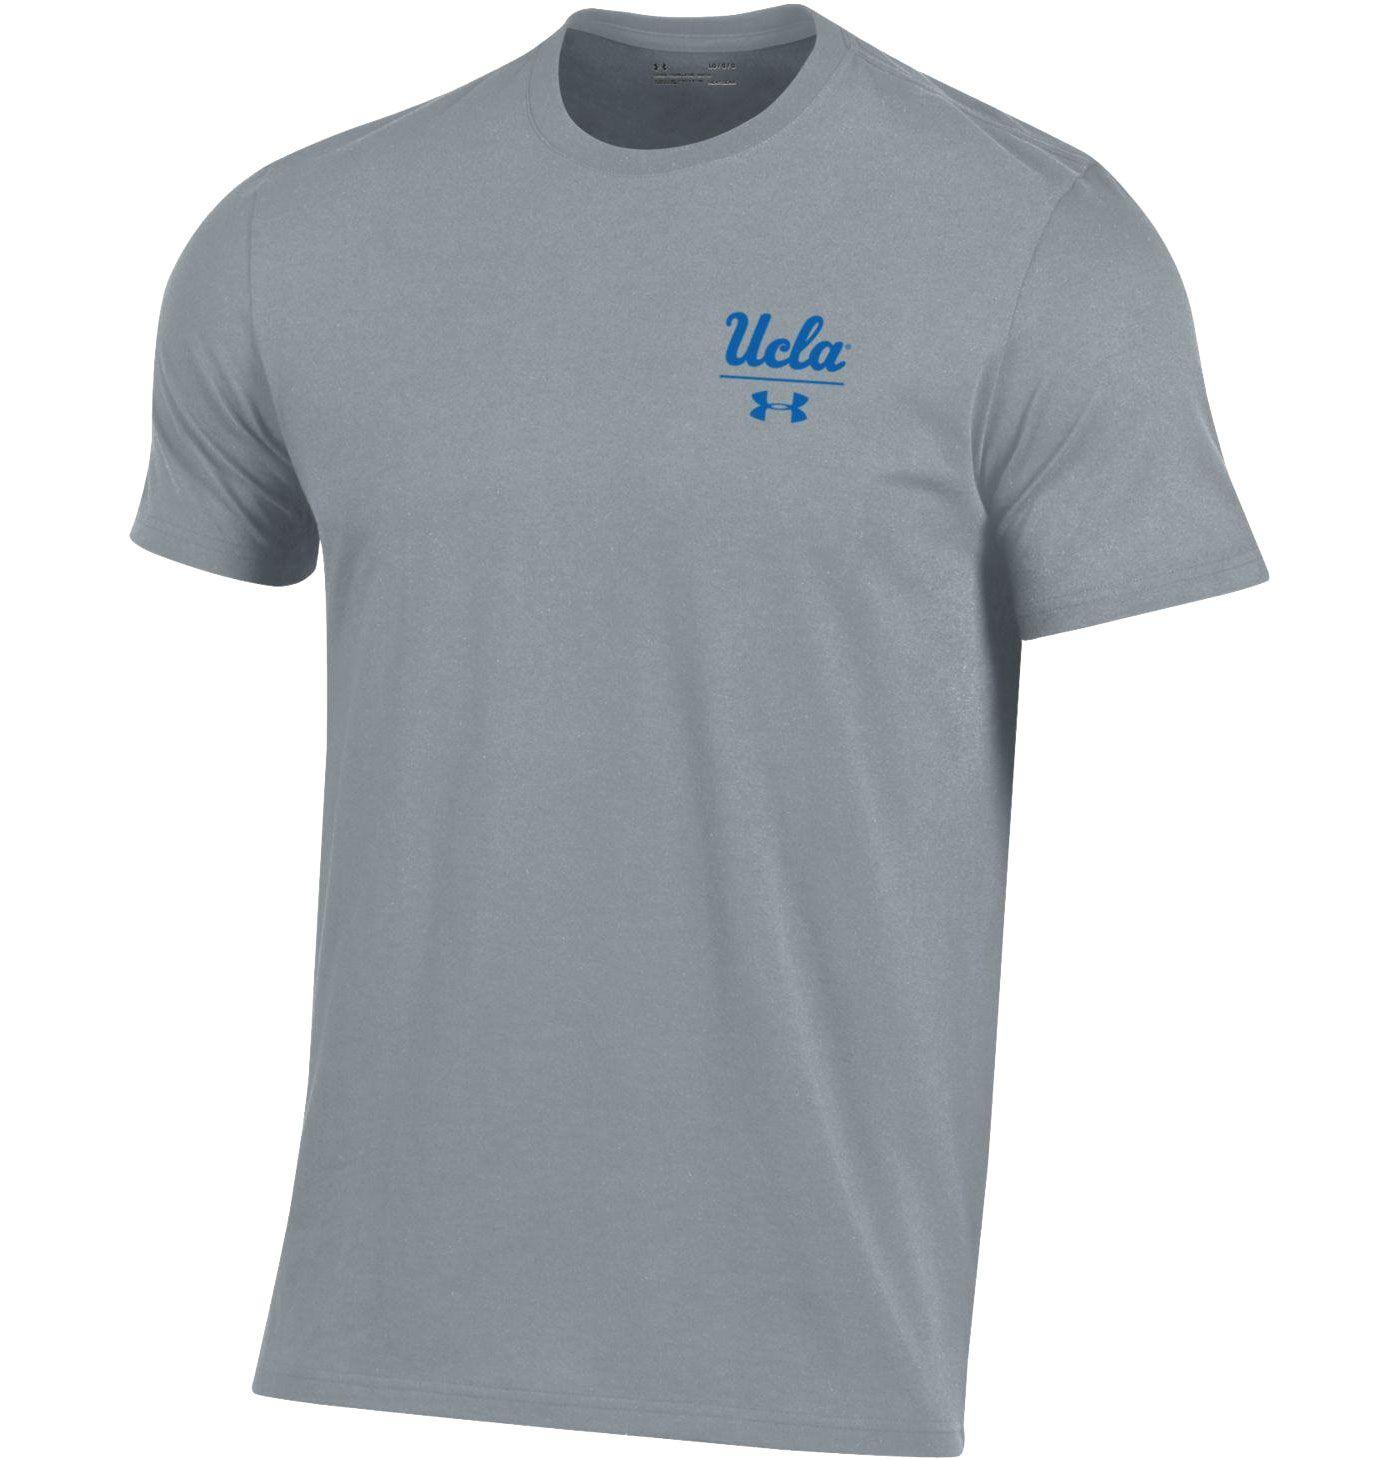 Under Armour Men's UCLA Bruins Grey 'Chip Kelly' Performance Cotton T-Shirt